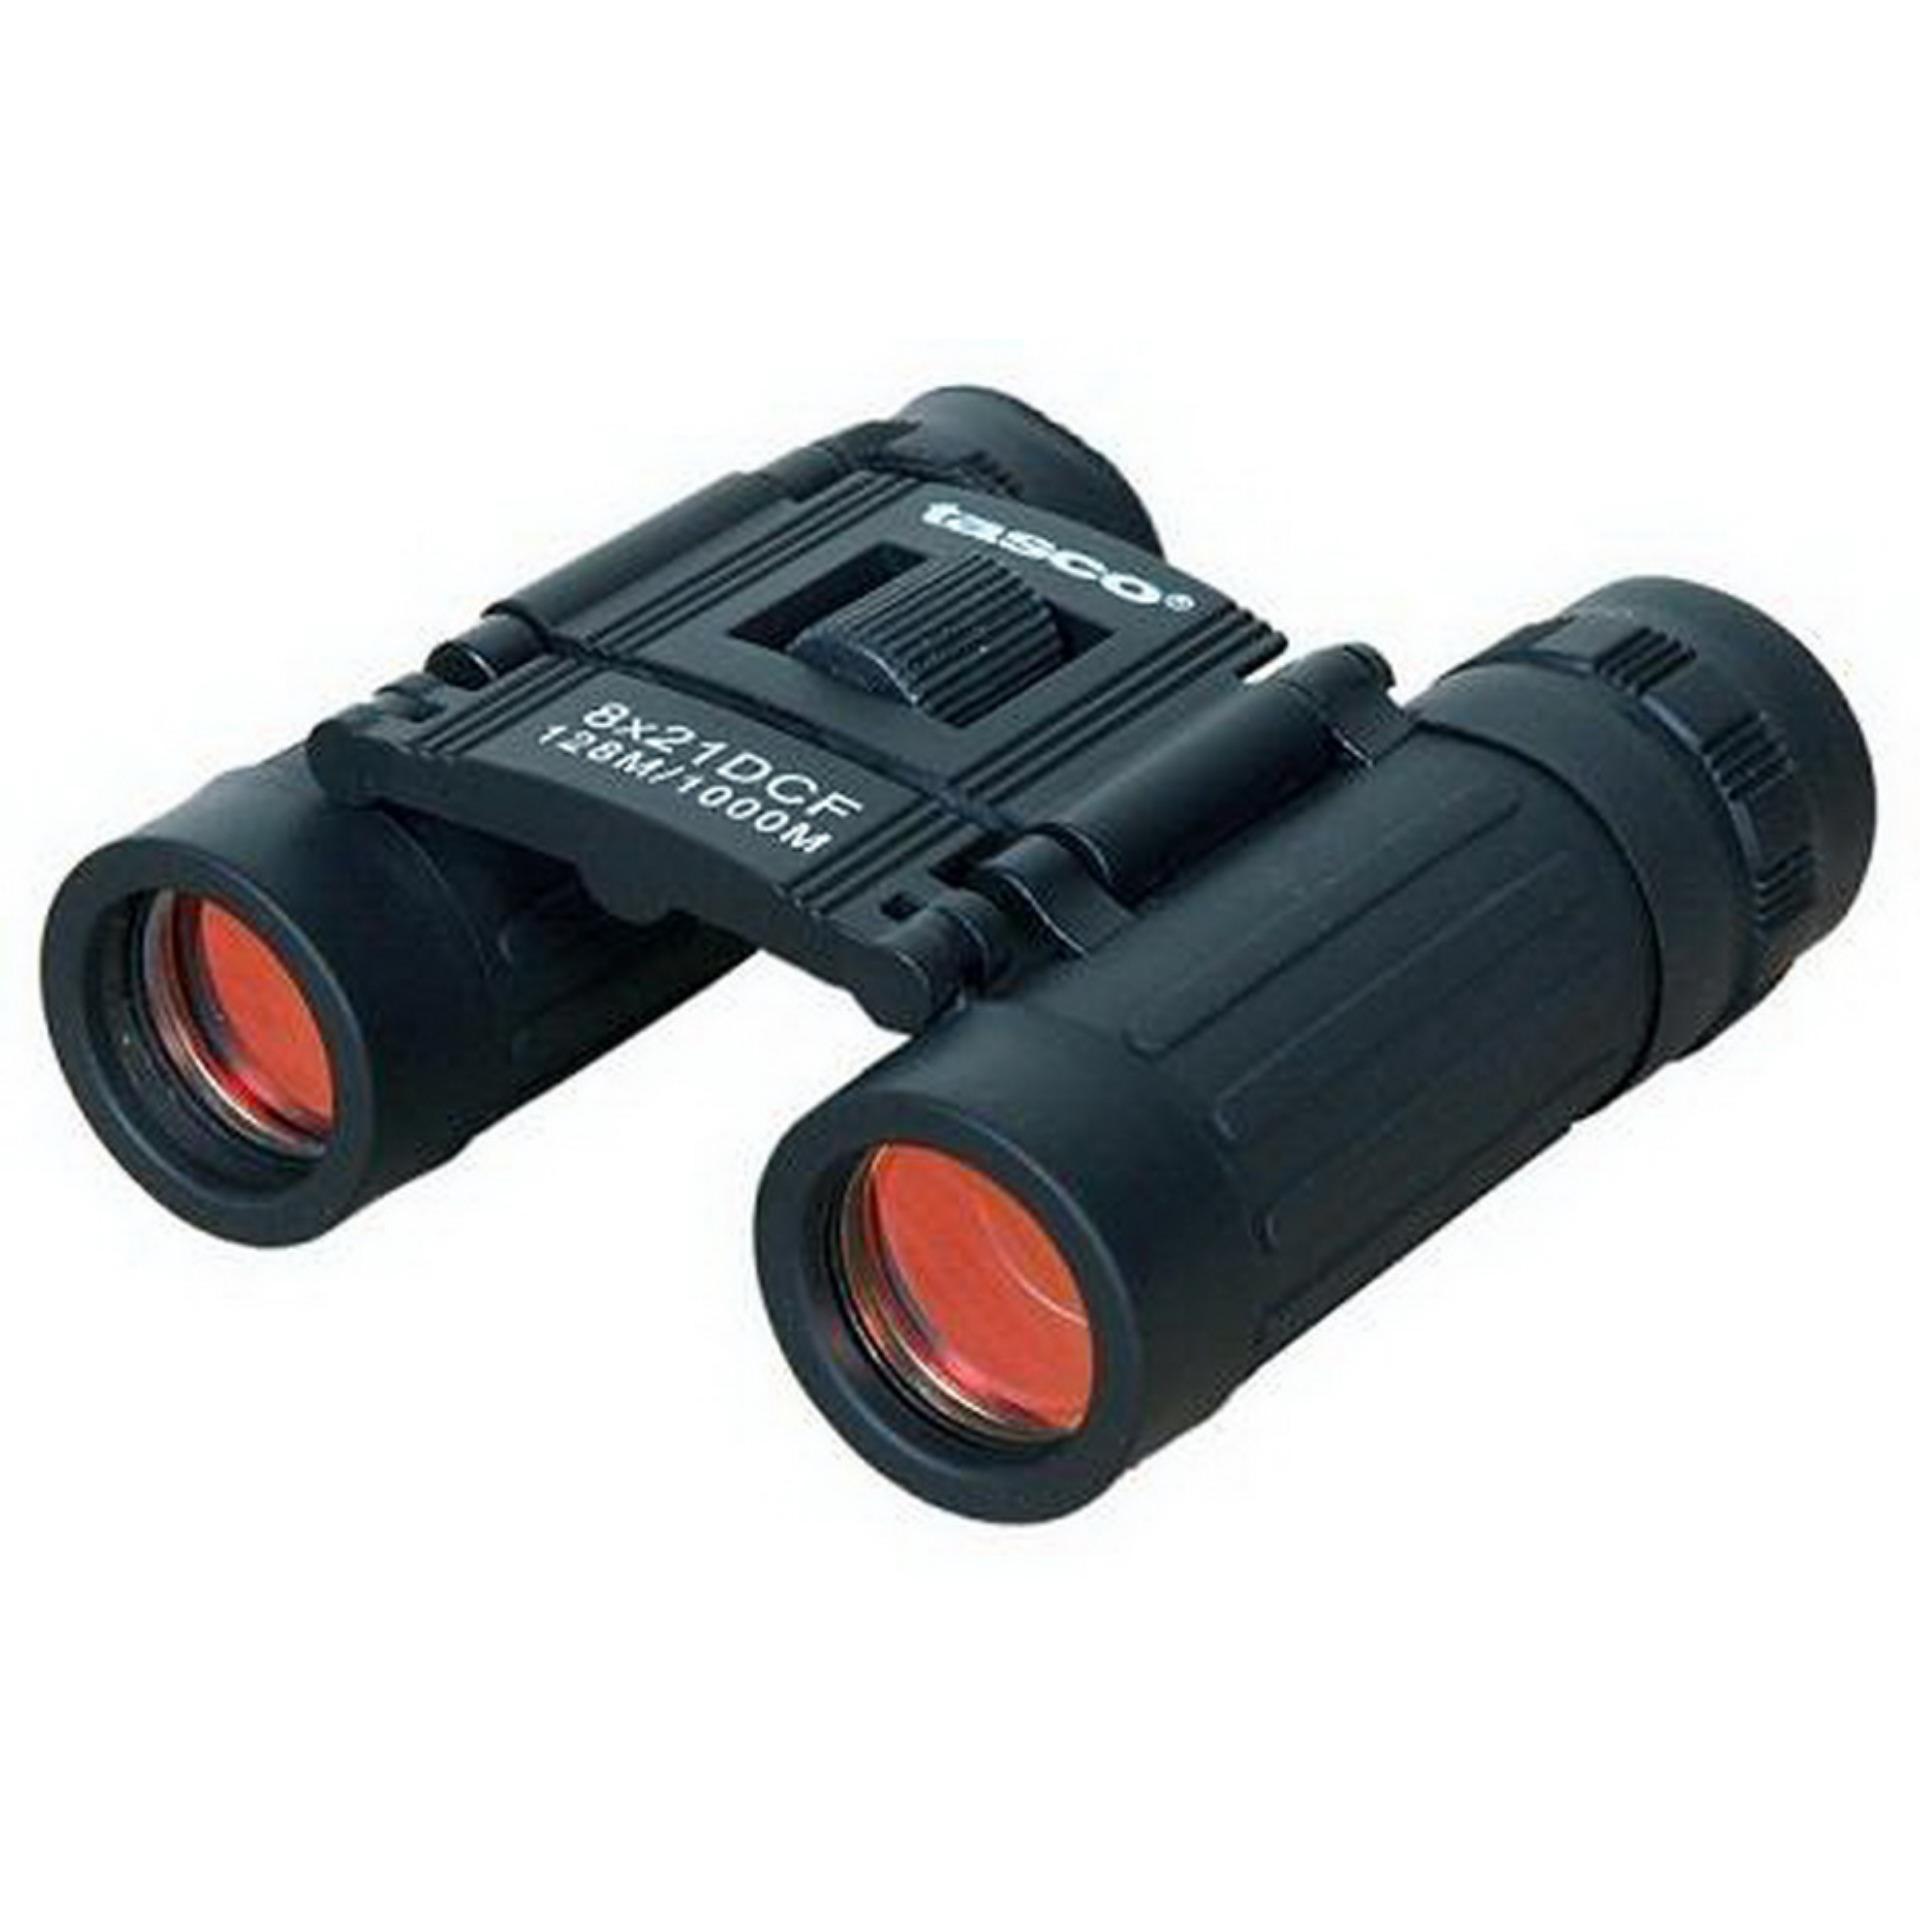 Teropong Tasco Binoculars 8x21